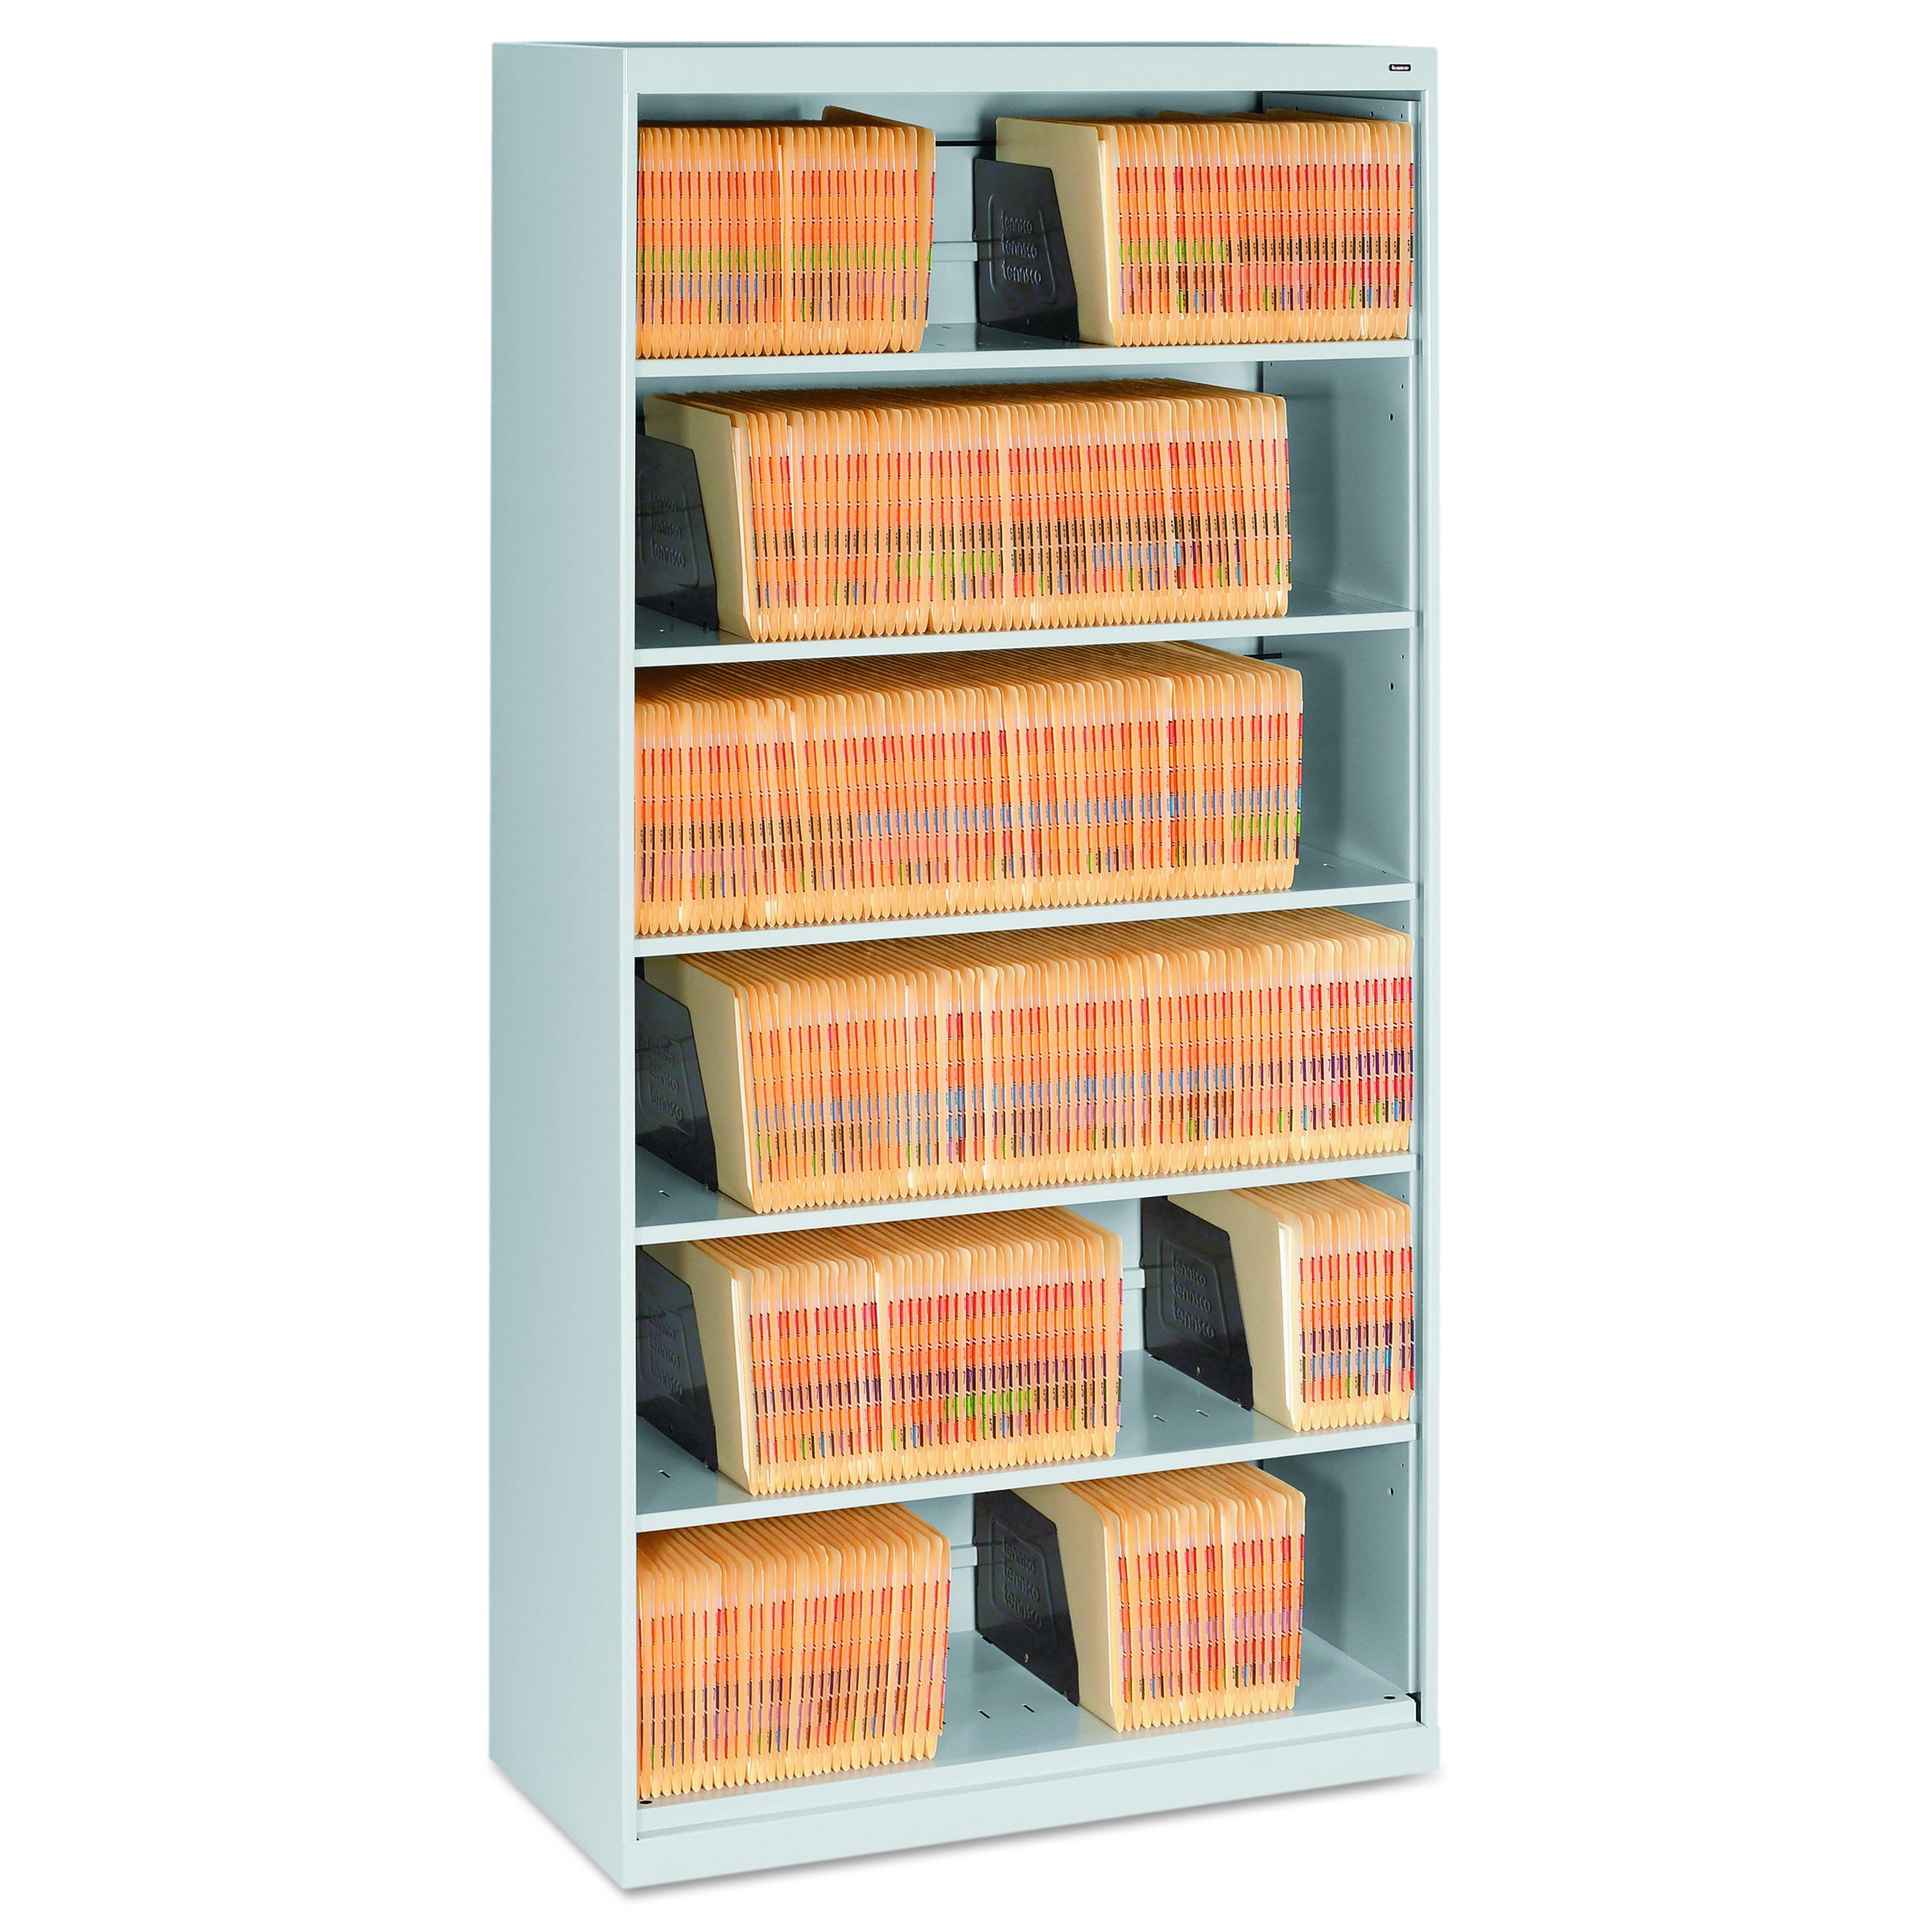 Tennsco FS360LGY Open Fixed Shelf Lateral File, 36w x 16 1/2d x 75 1/4, Light Gray